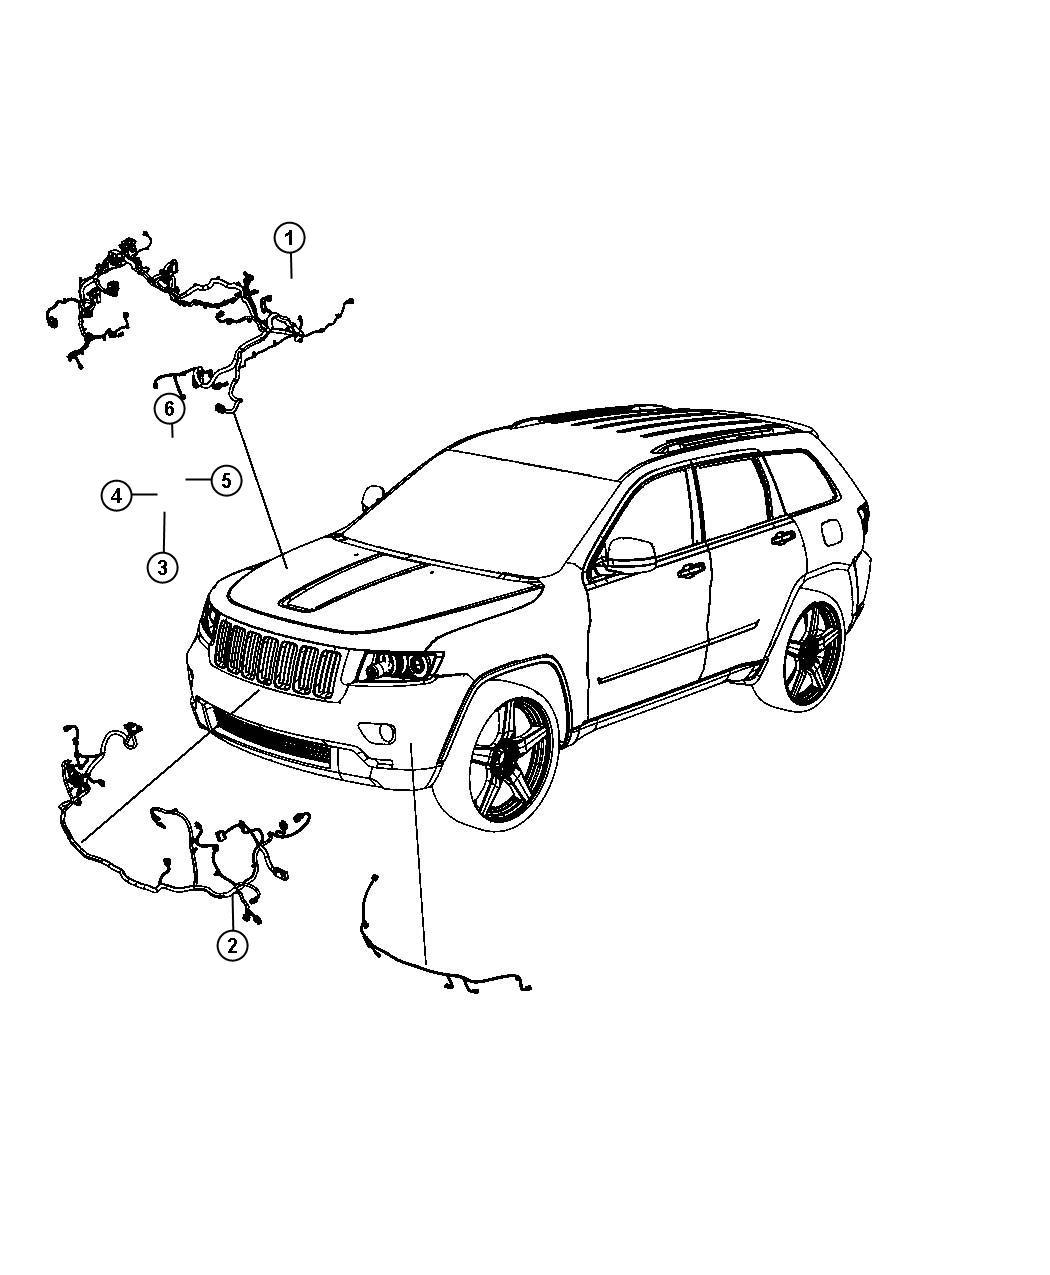 Jeep Grand Cherokee Wiring. Headlamp to dash. [bi-xenon